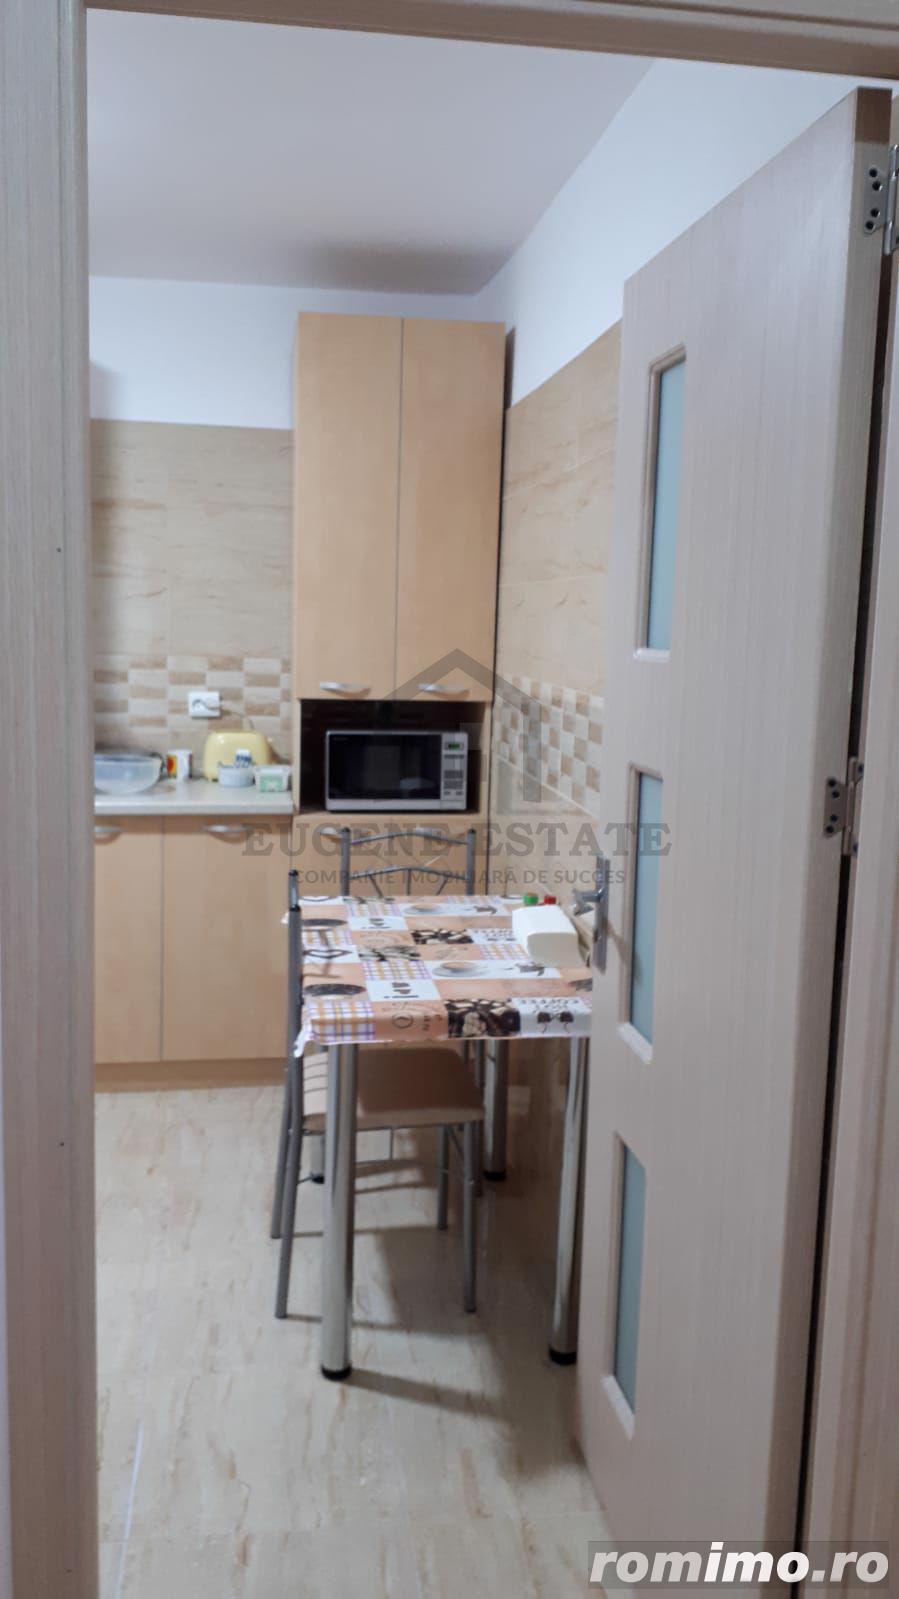 Apartament 2 camere Renovat, Drumul Gazarului